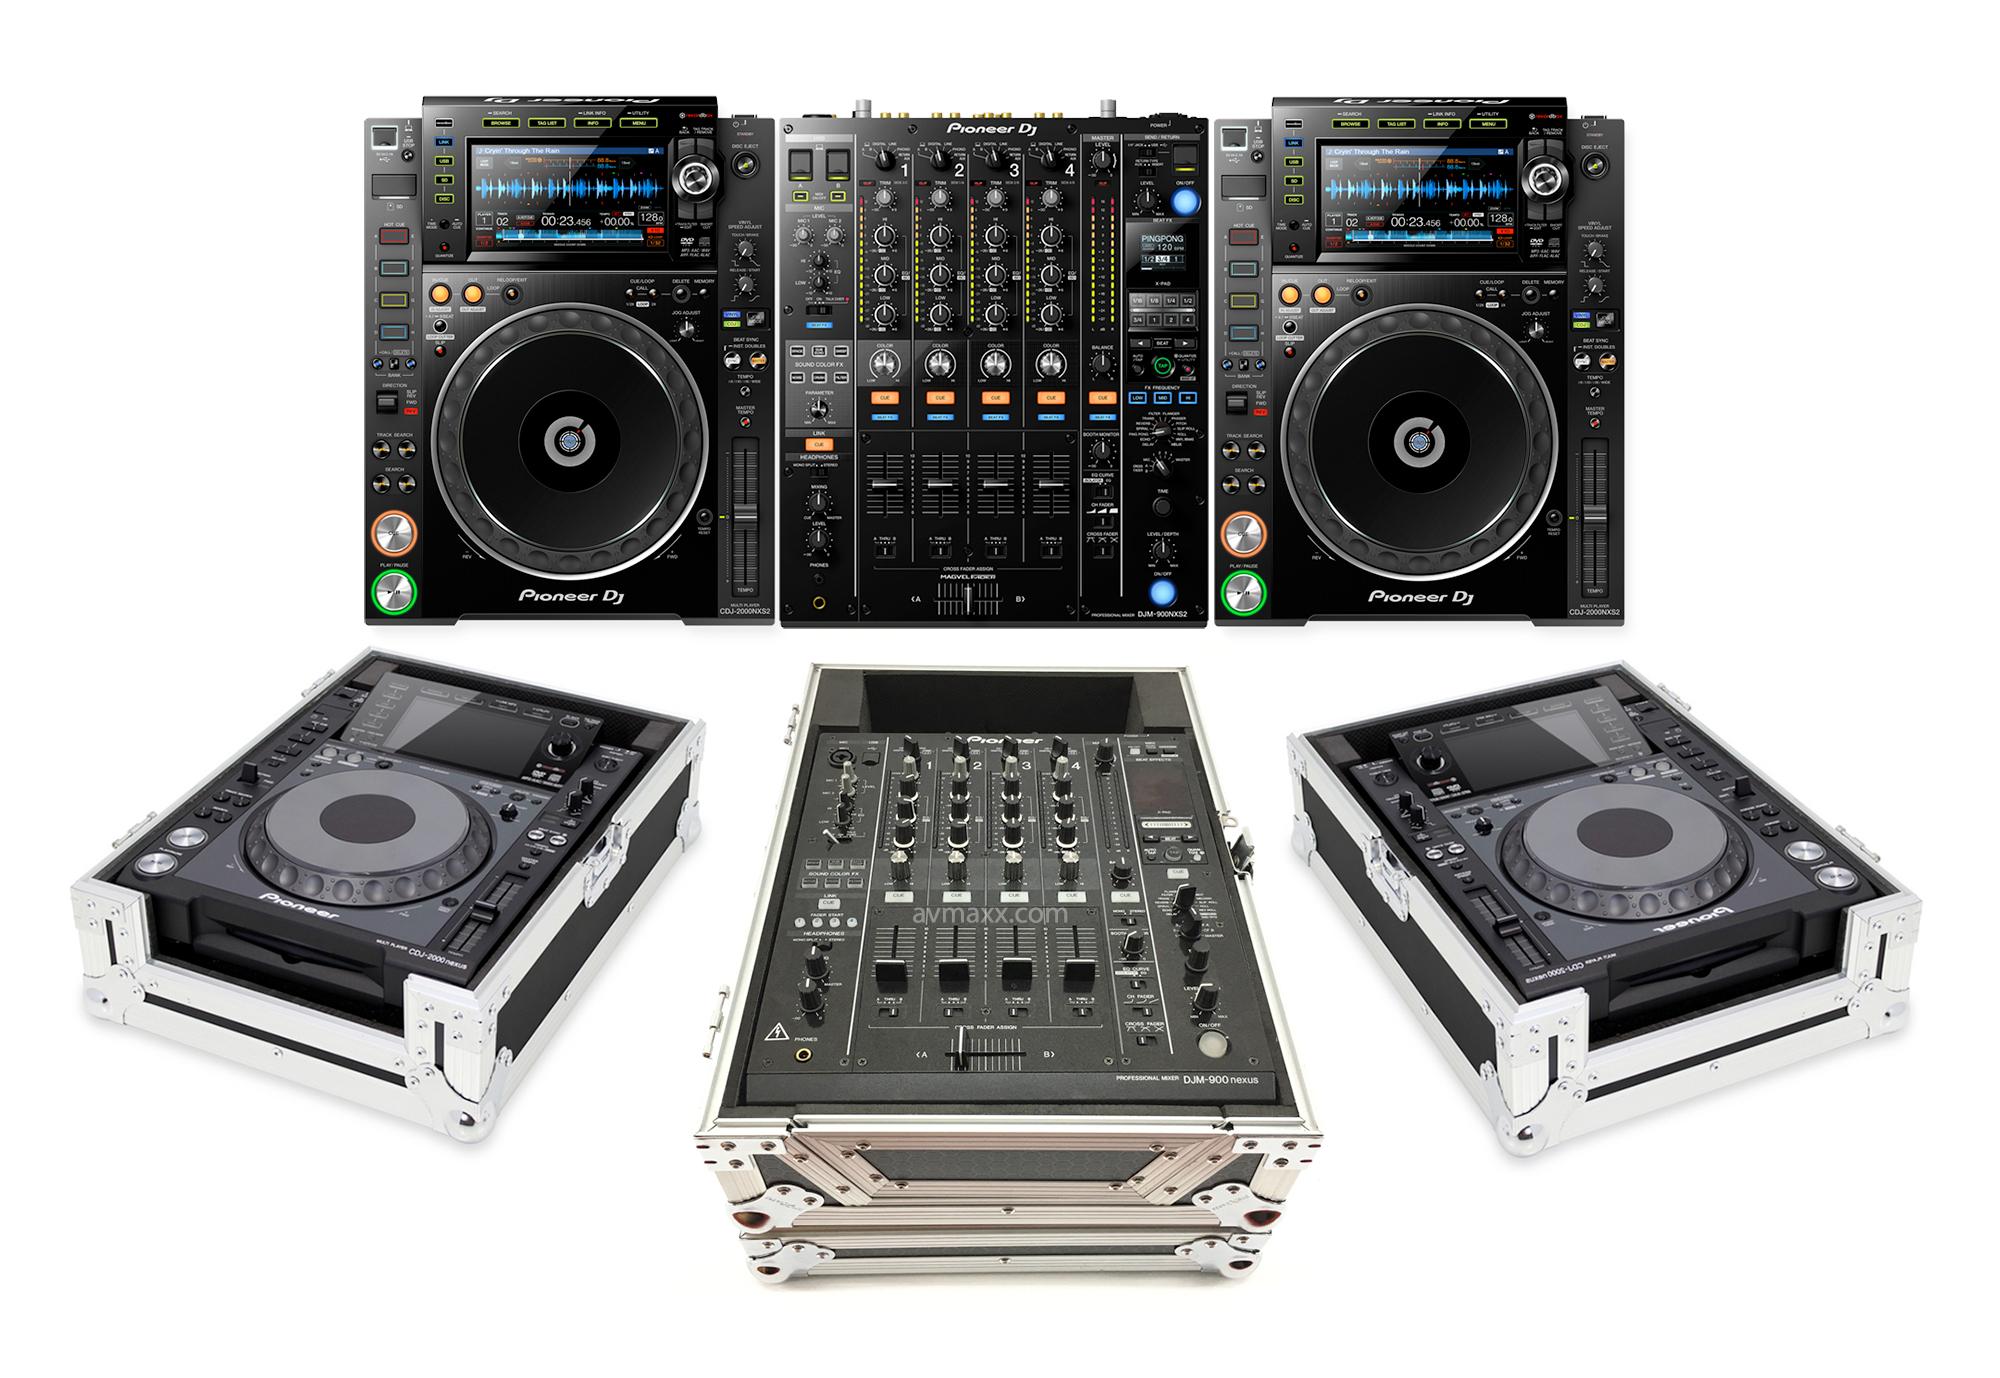 pioneer dj cdj 2000nxs2 multi players djm 900nxs2 4 channel mixer pro dj system package. Black Bedroom Furniture Sets. Home Design Ideas